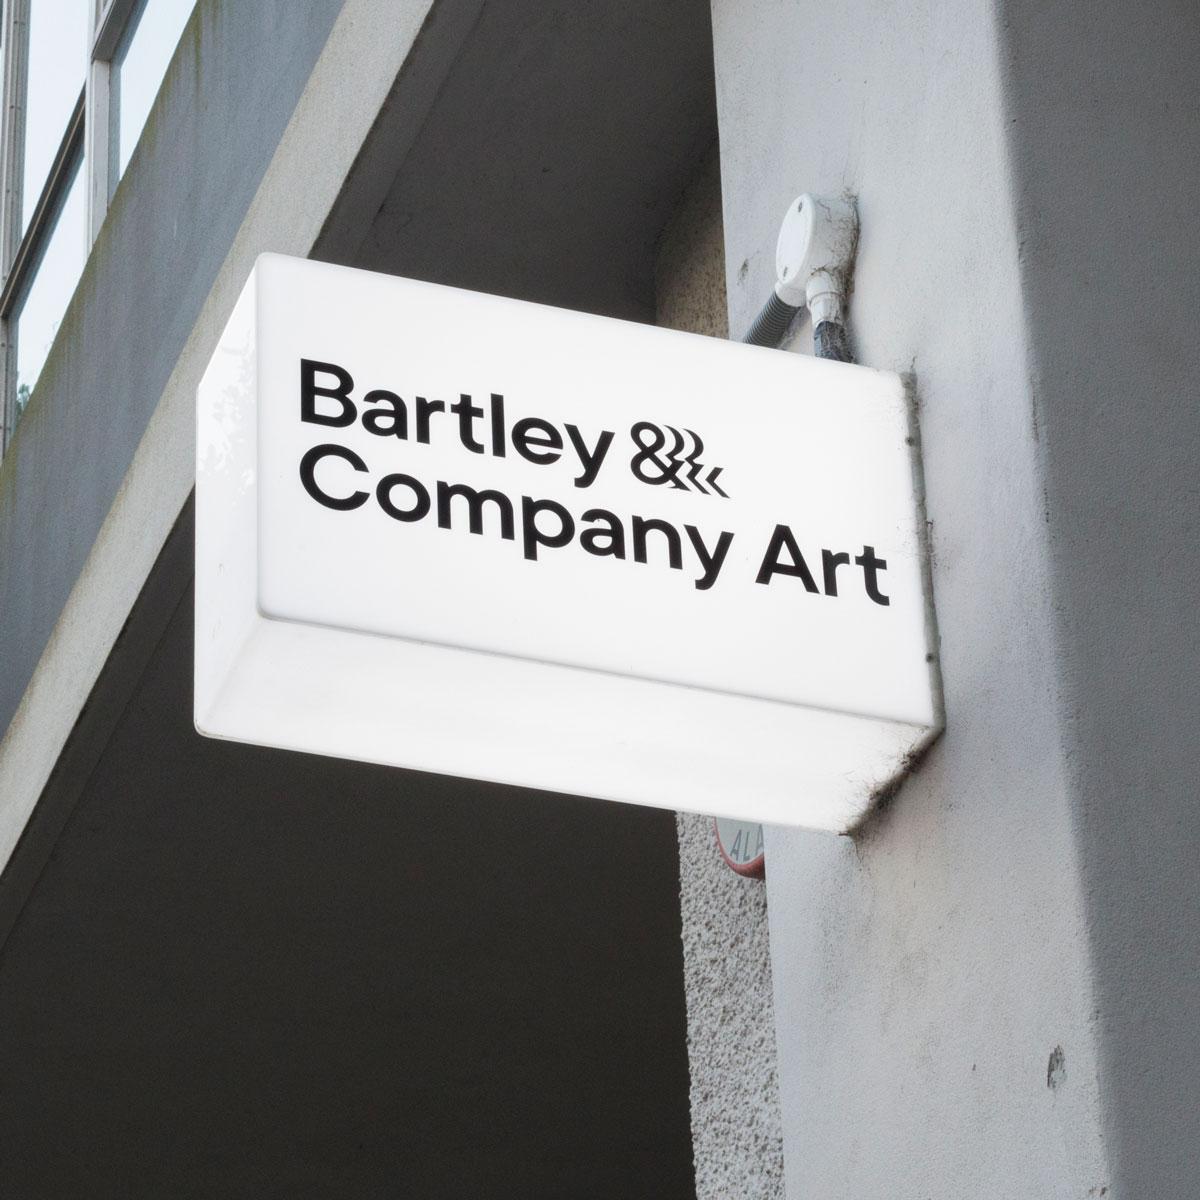 Bartley & Company Art